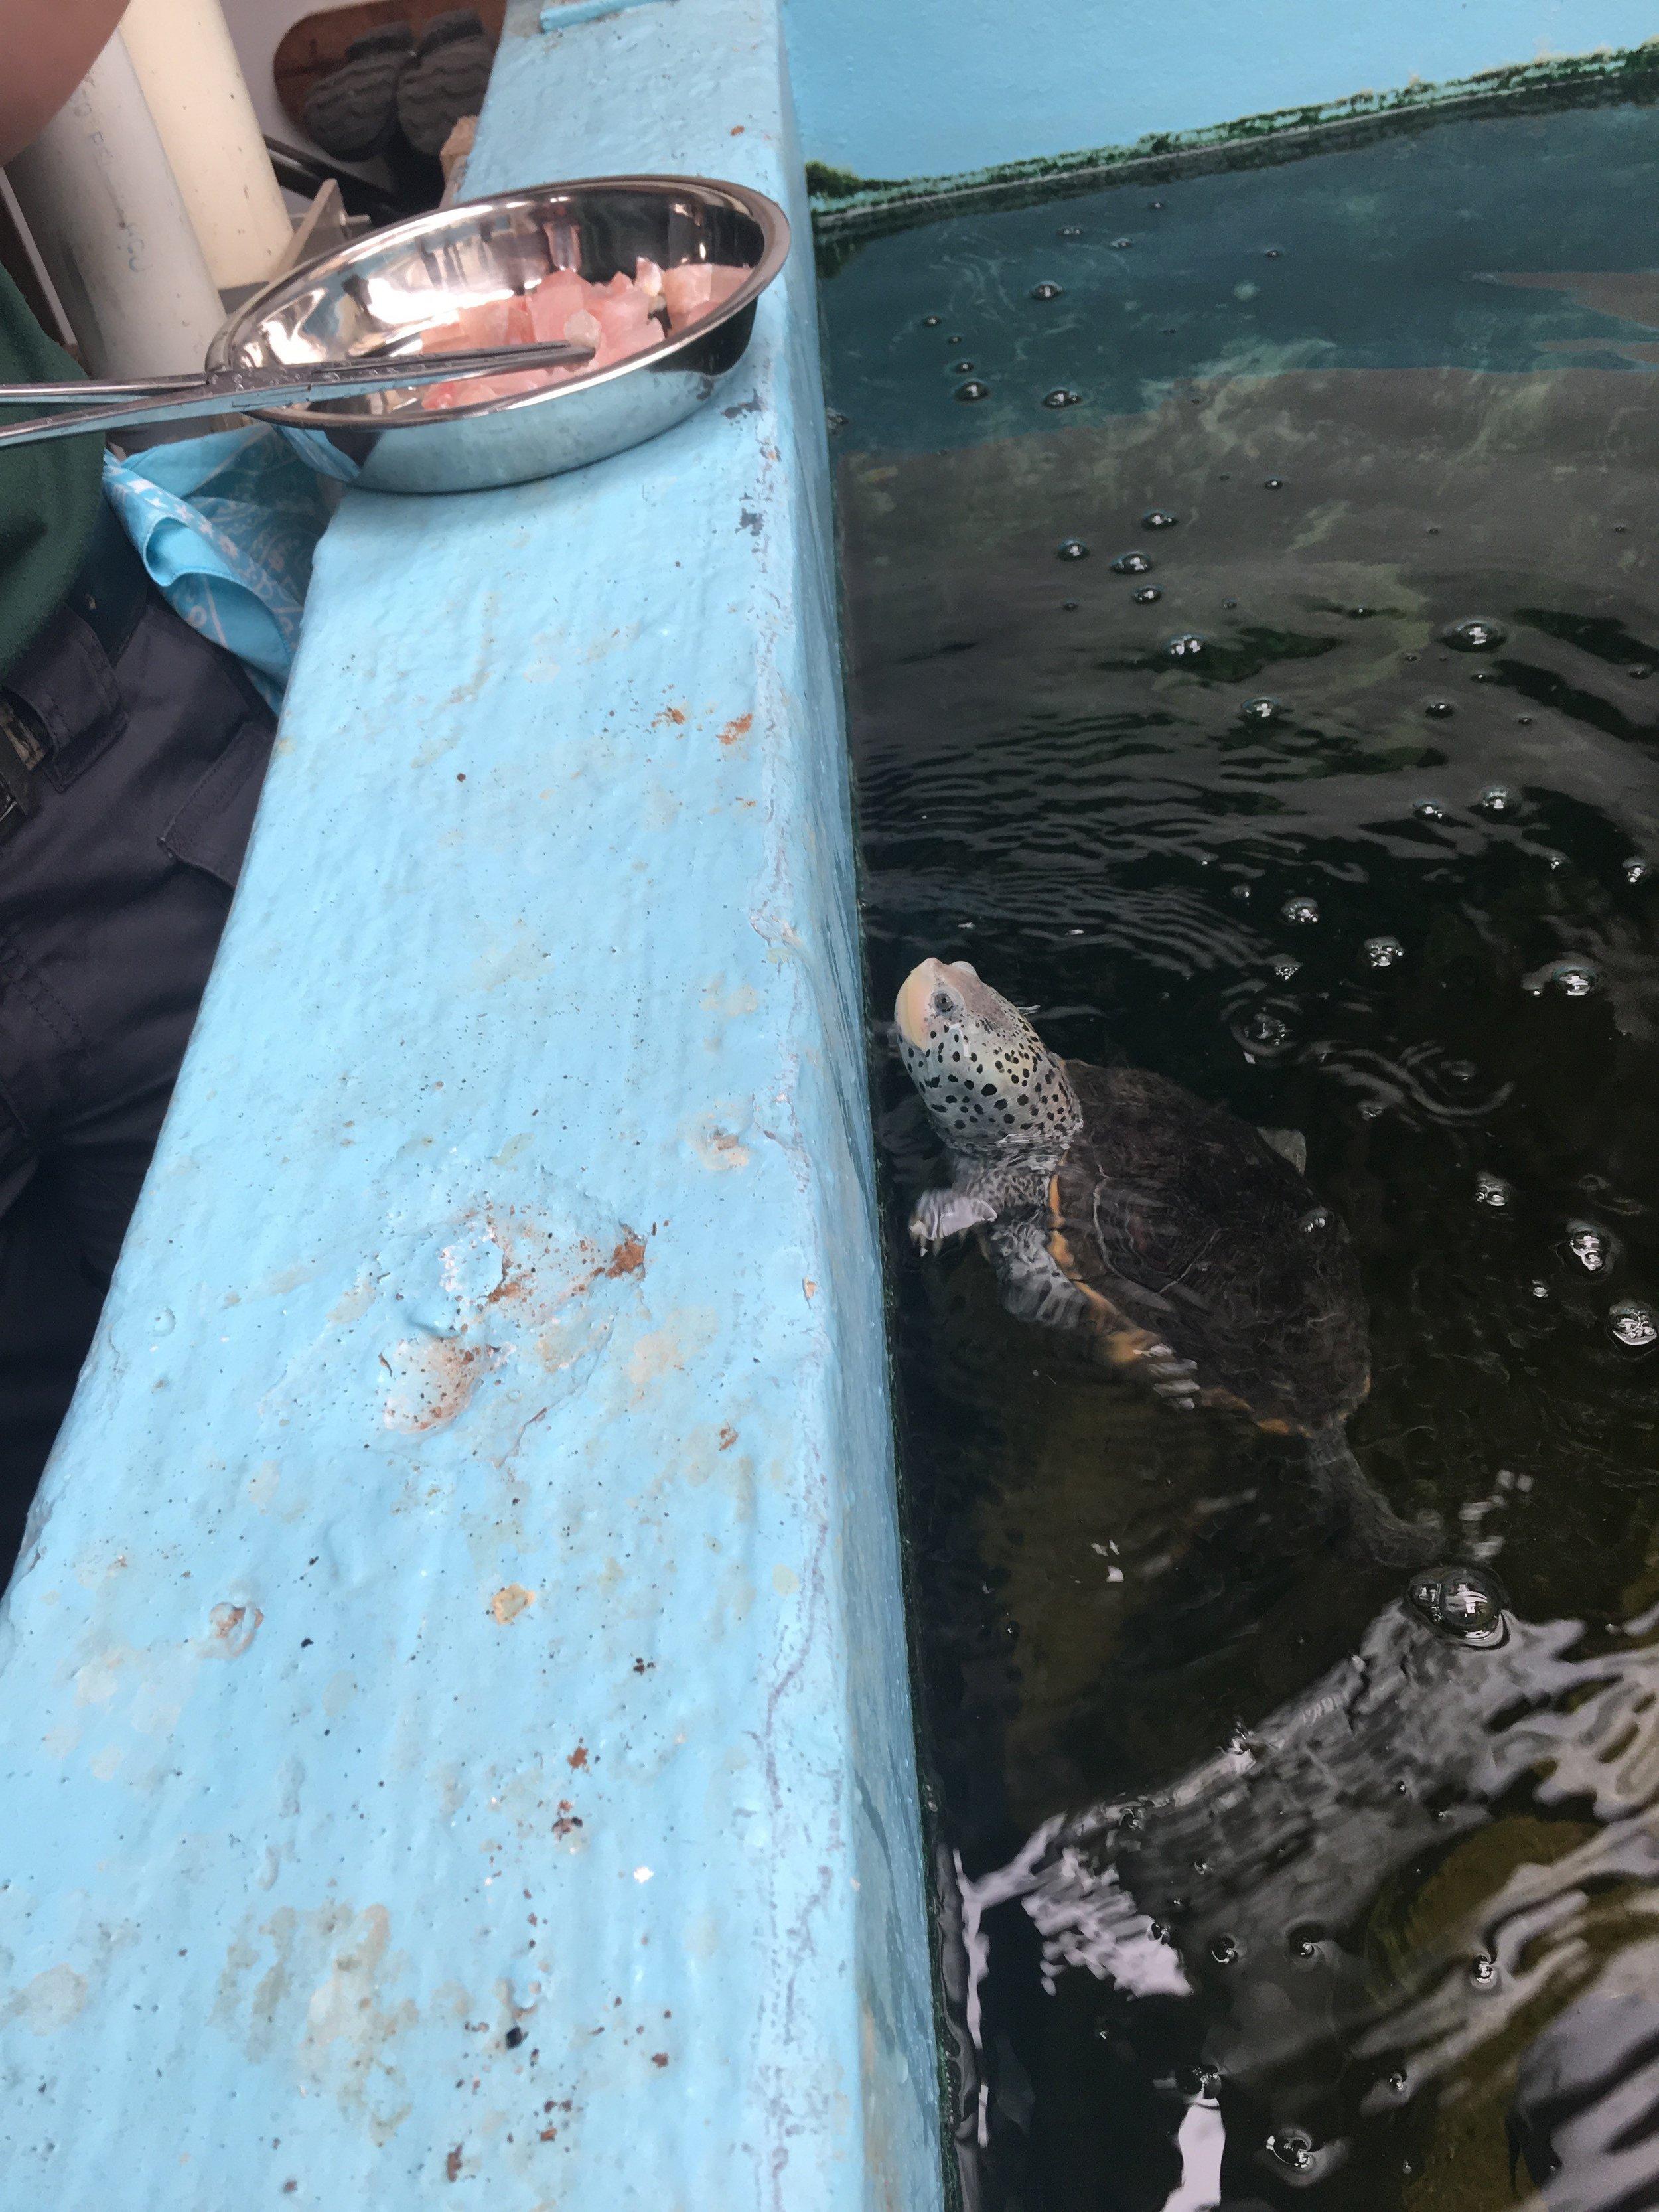 zoo feeding fish.jpg